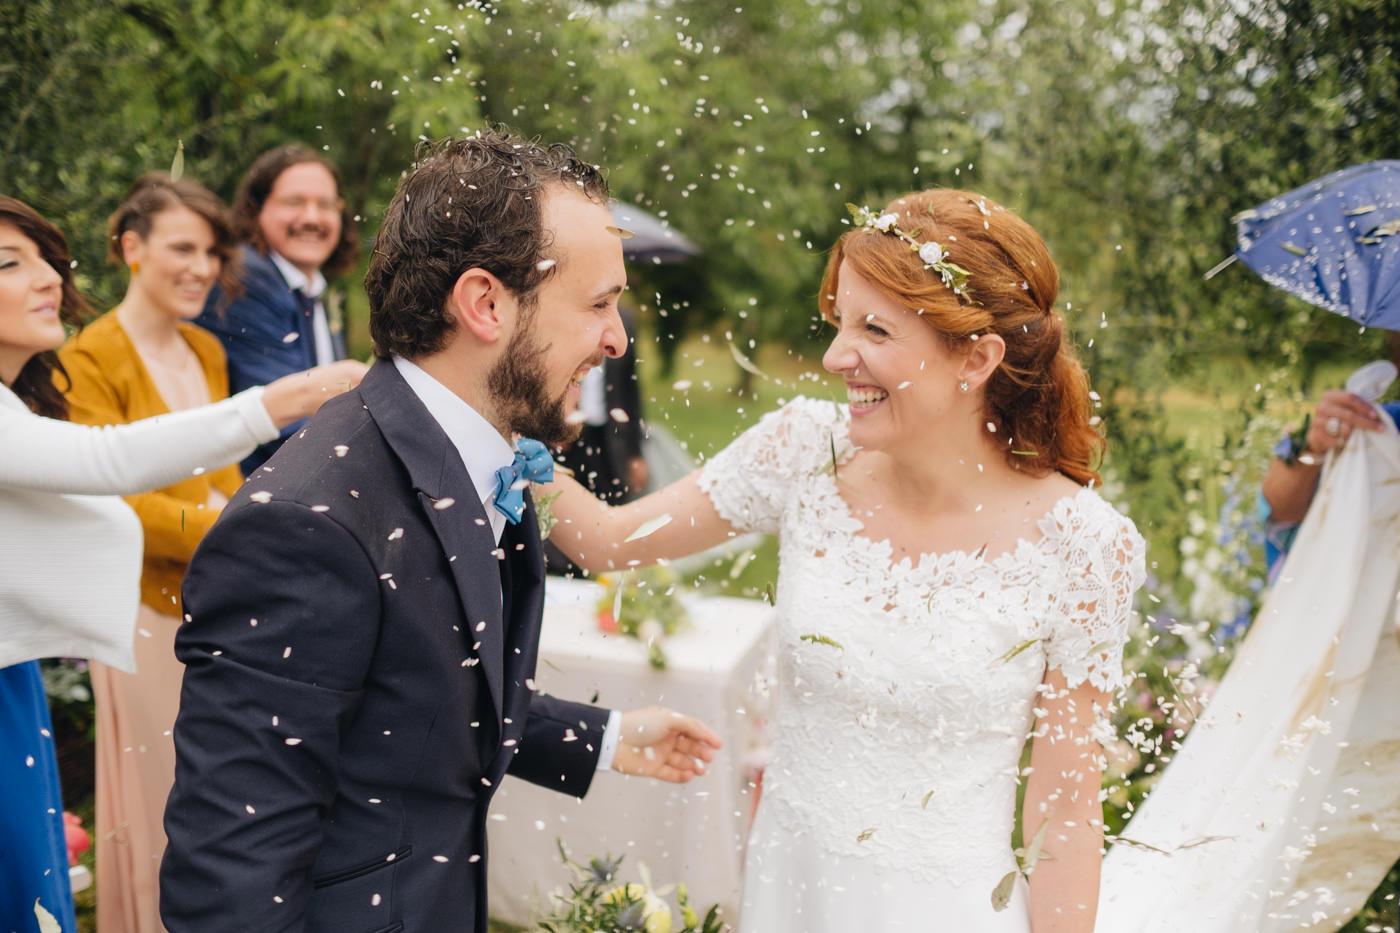 matrimoni_all_italiana_fotografo_matrimonio_toscana-46.jpg